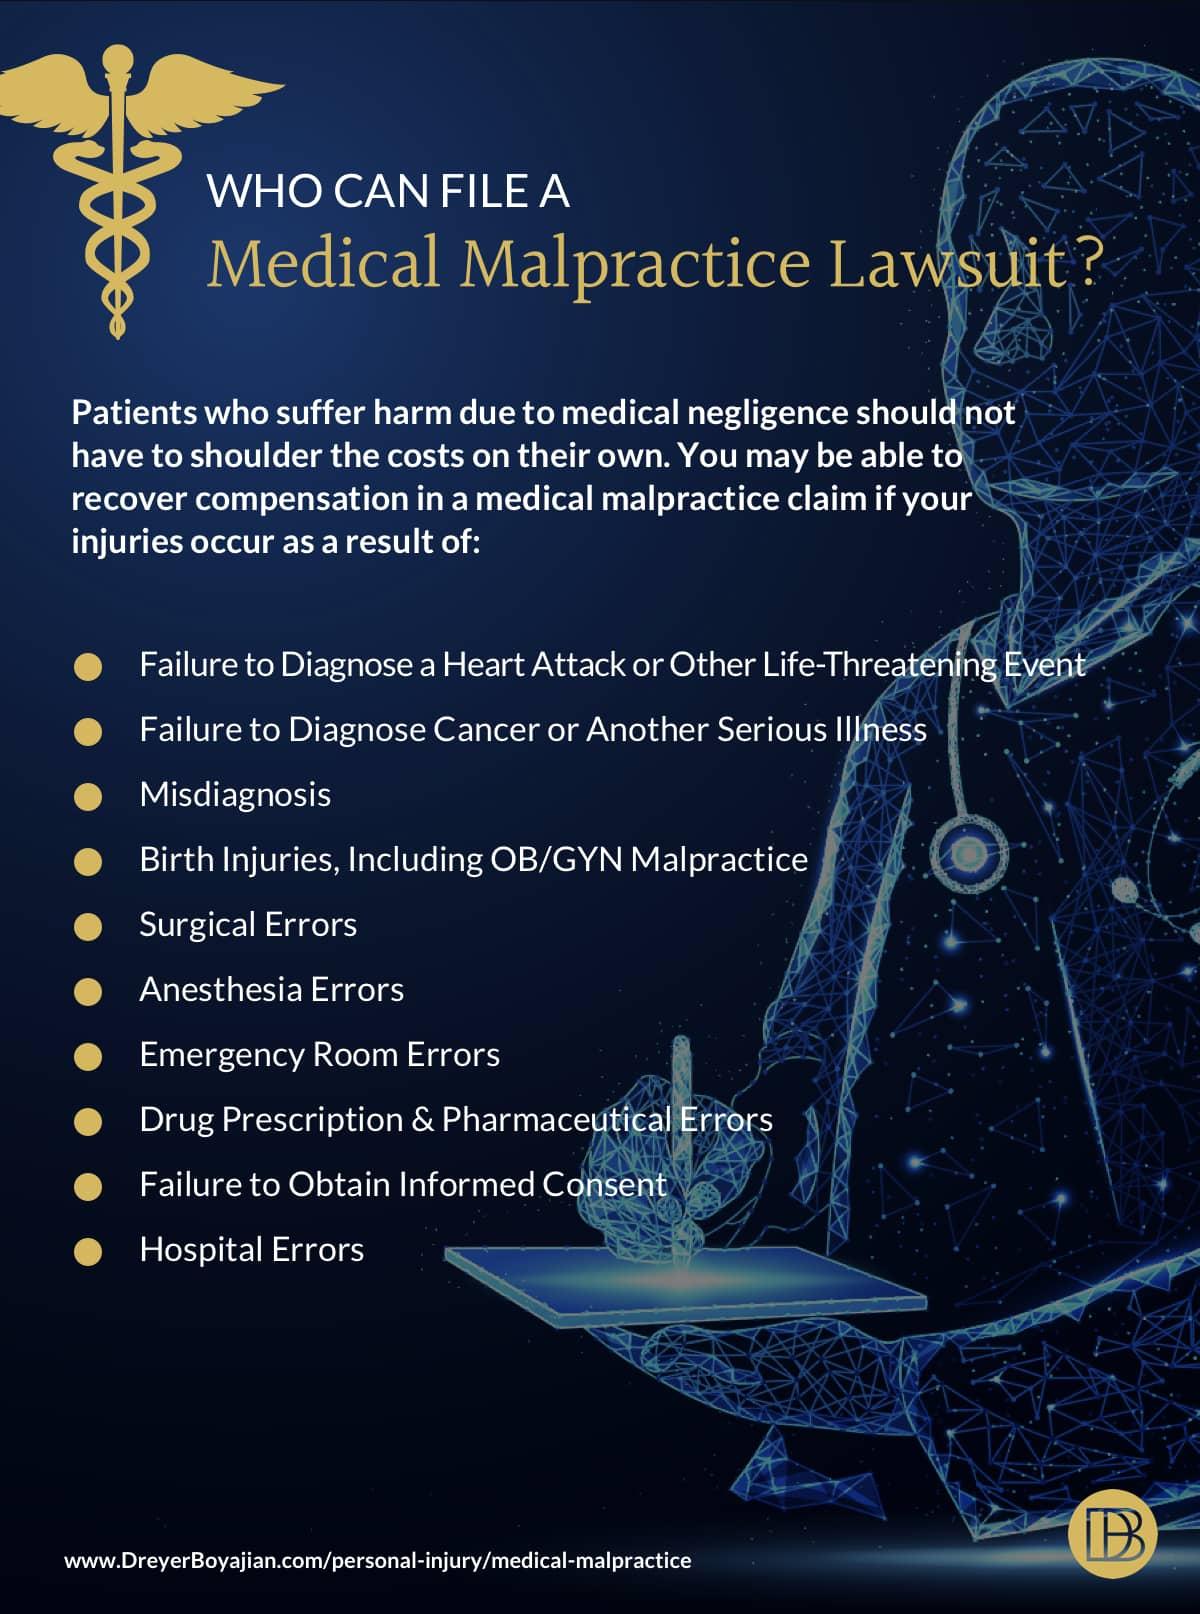 Filing a Claim for Medical Malpractice | Dreyer Boyajian LLP